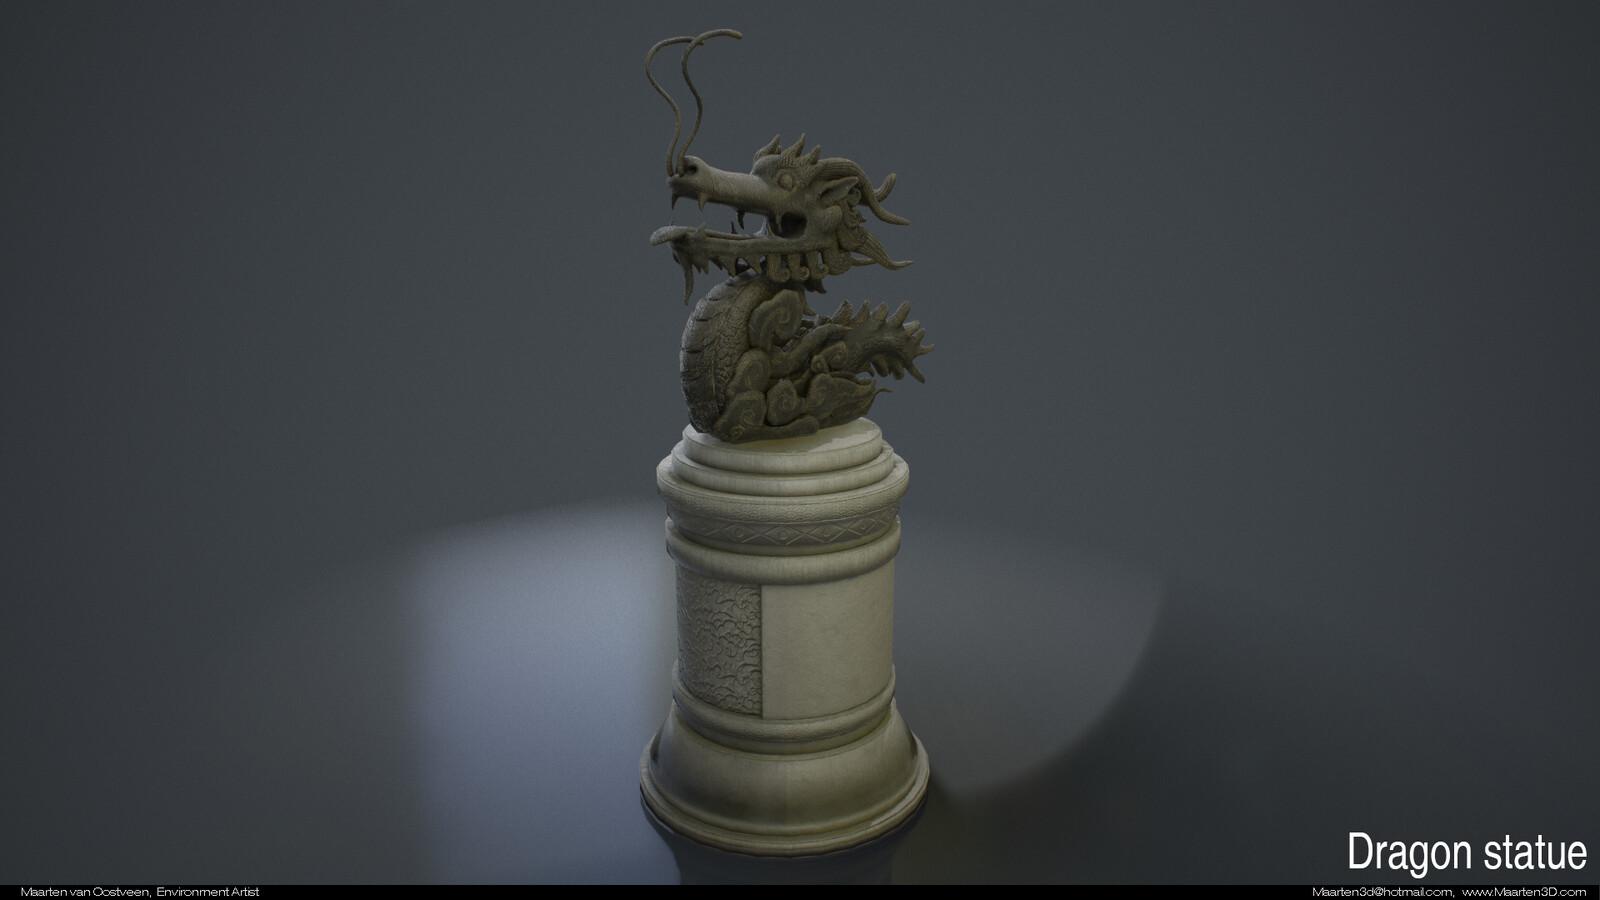 Dragonstatue